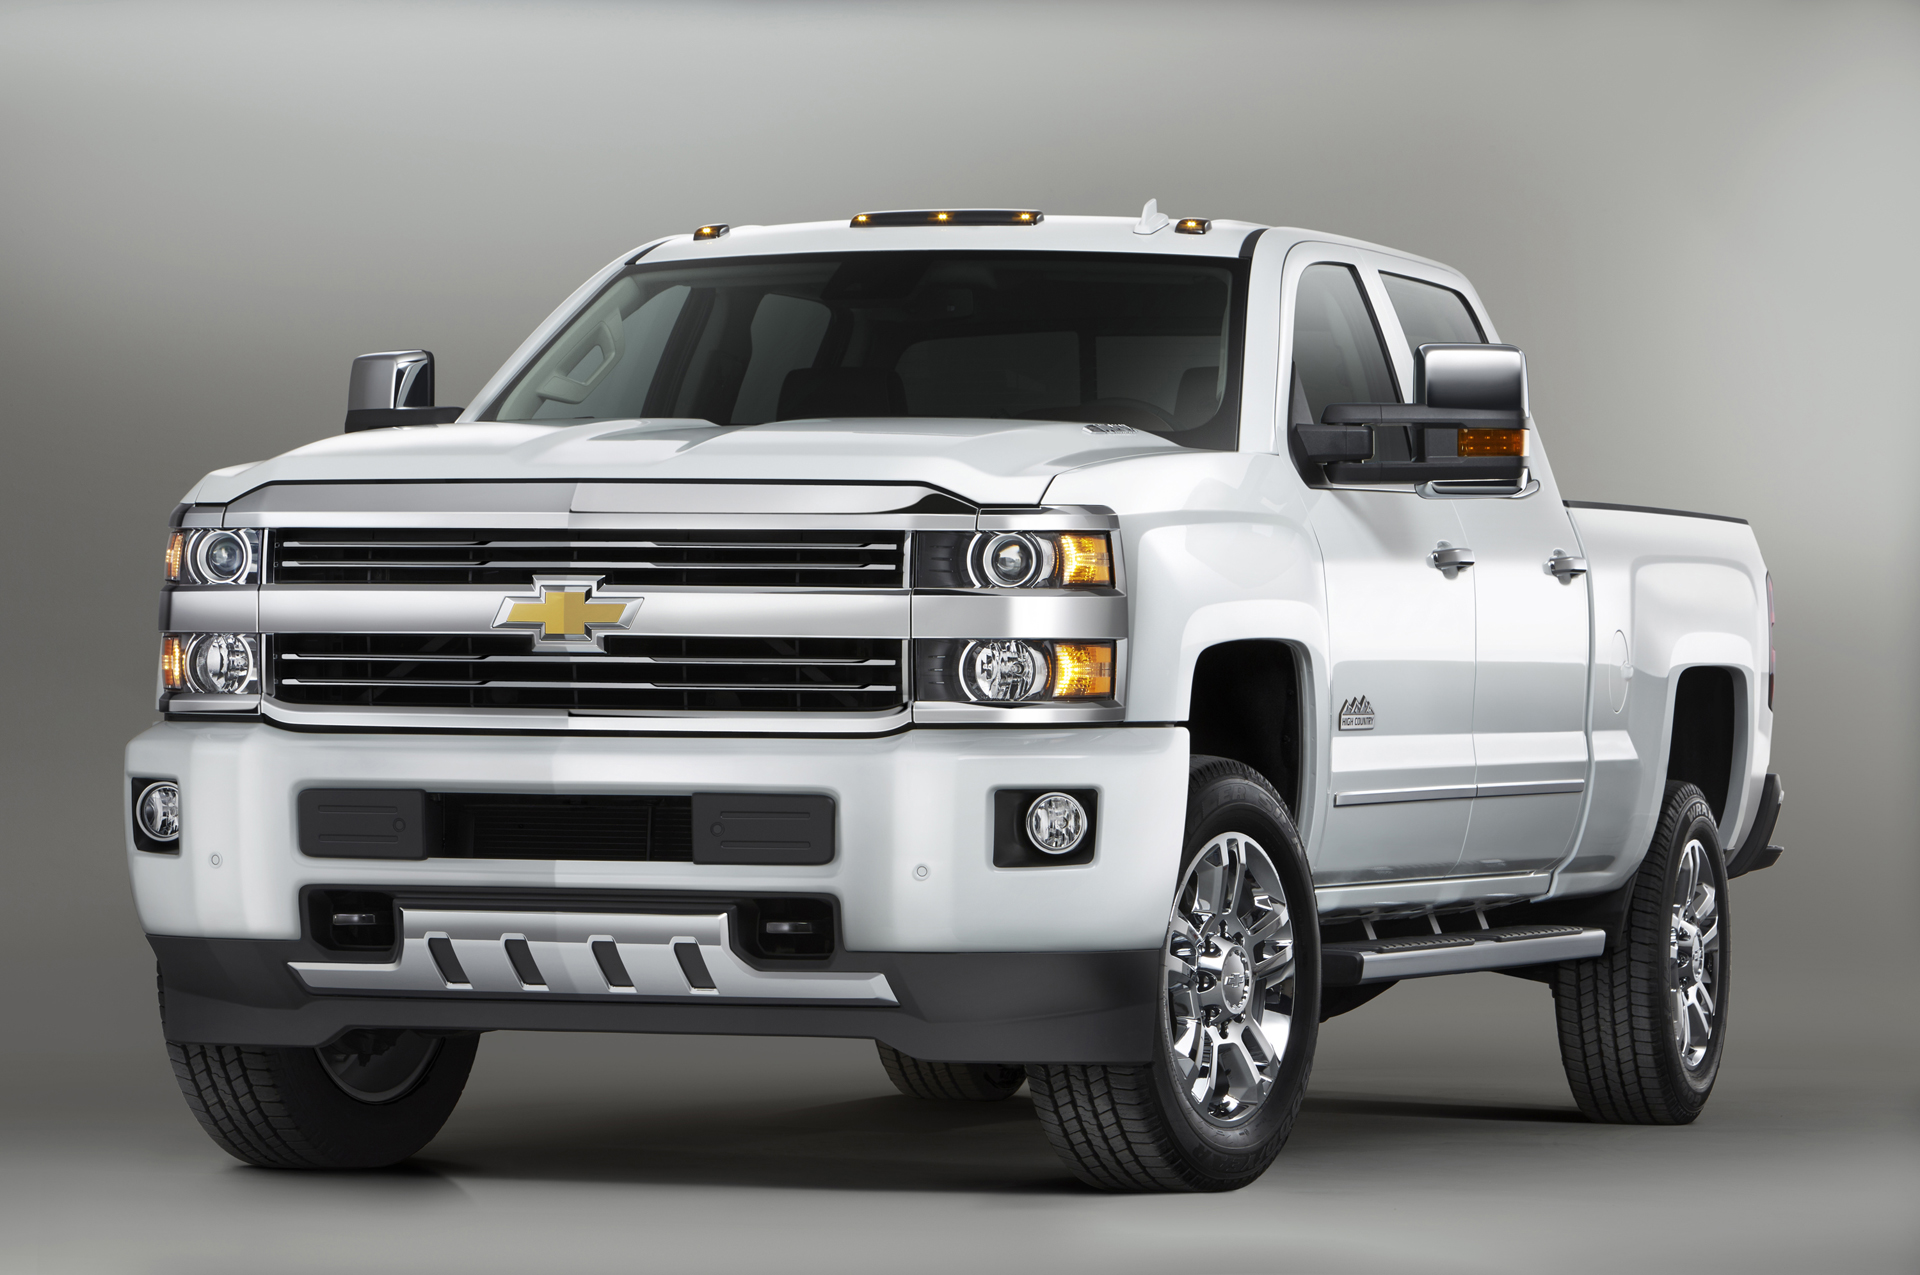 en pressroom silverado us vehicles states silveradohd trucks media chevrolet united